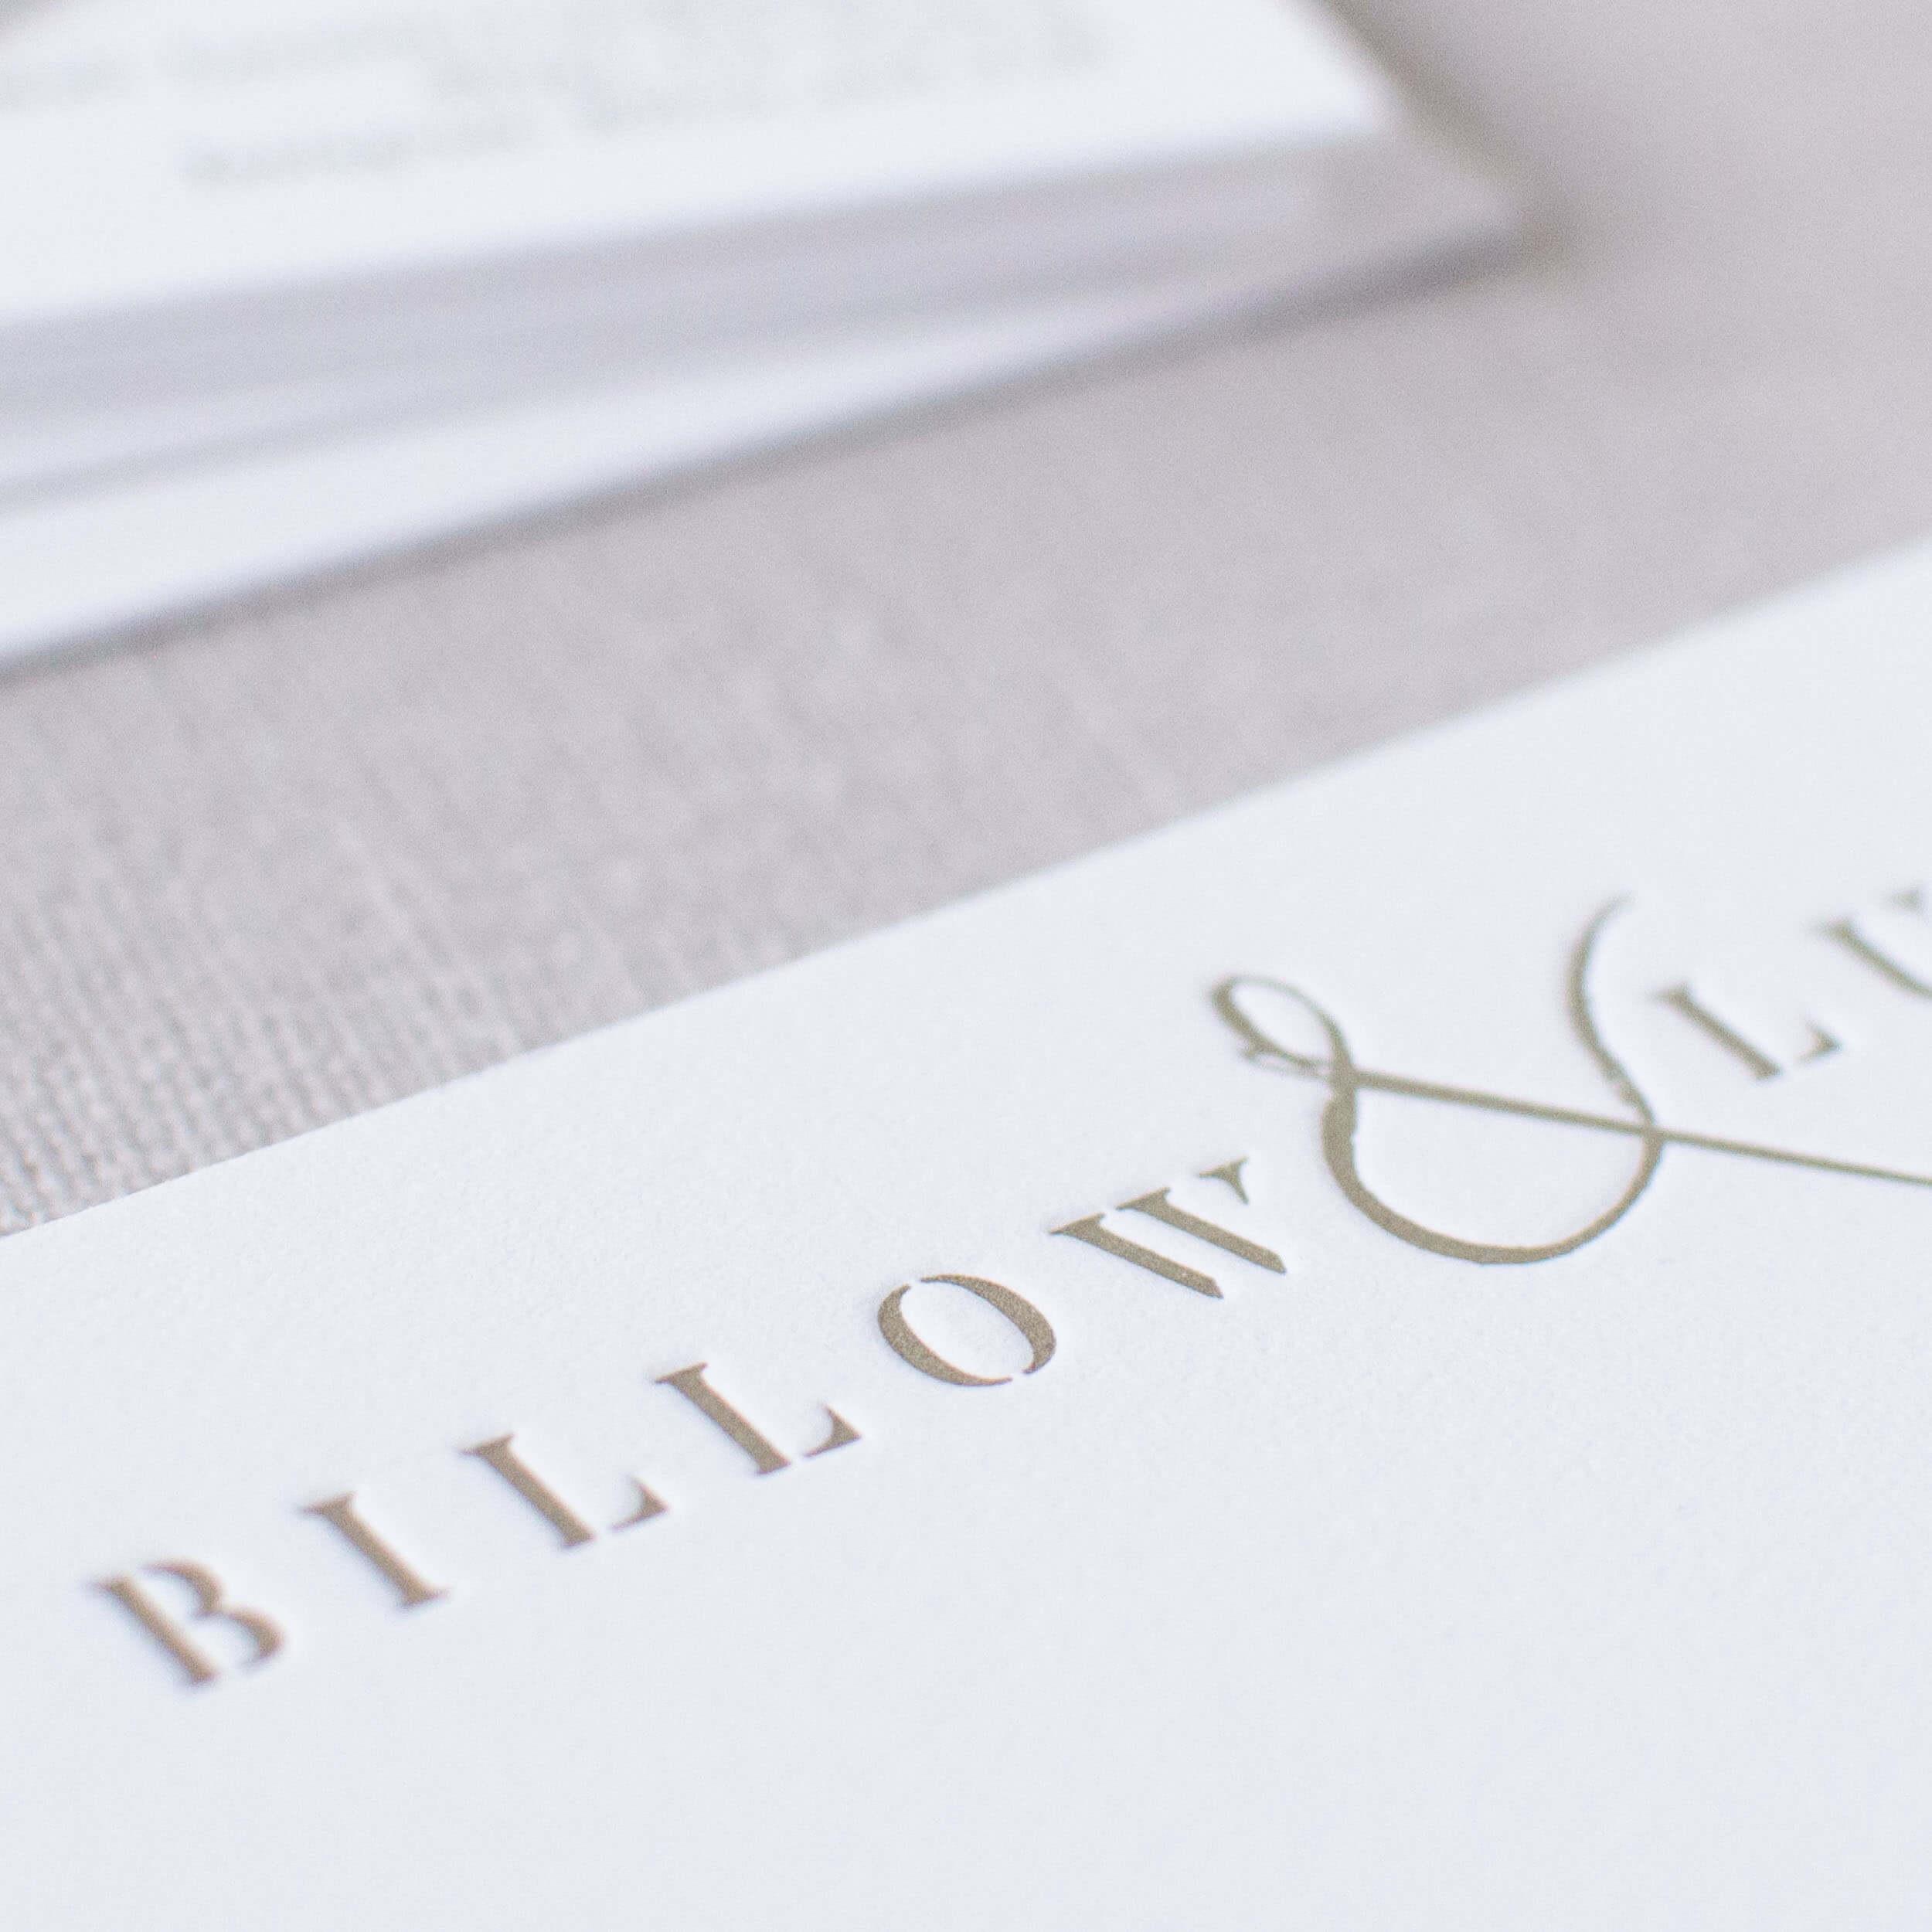 letterpress-gold-ink-branding-billow-luft-2.jpg